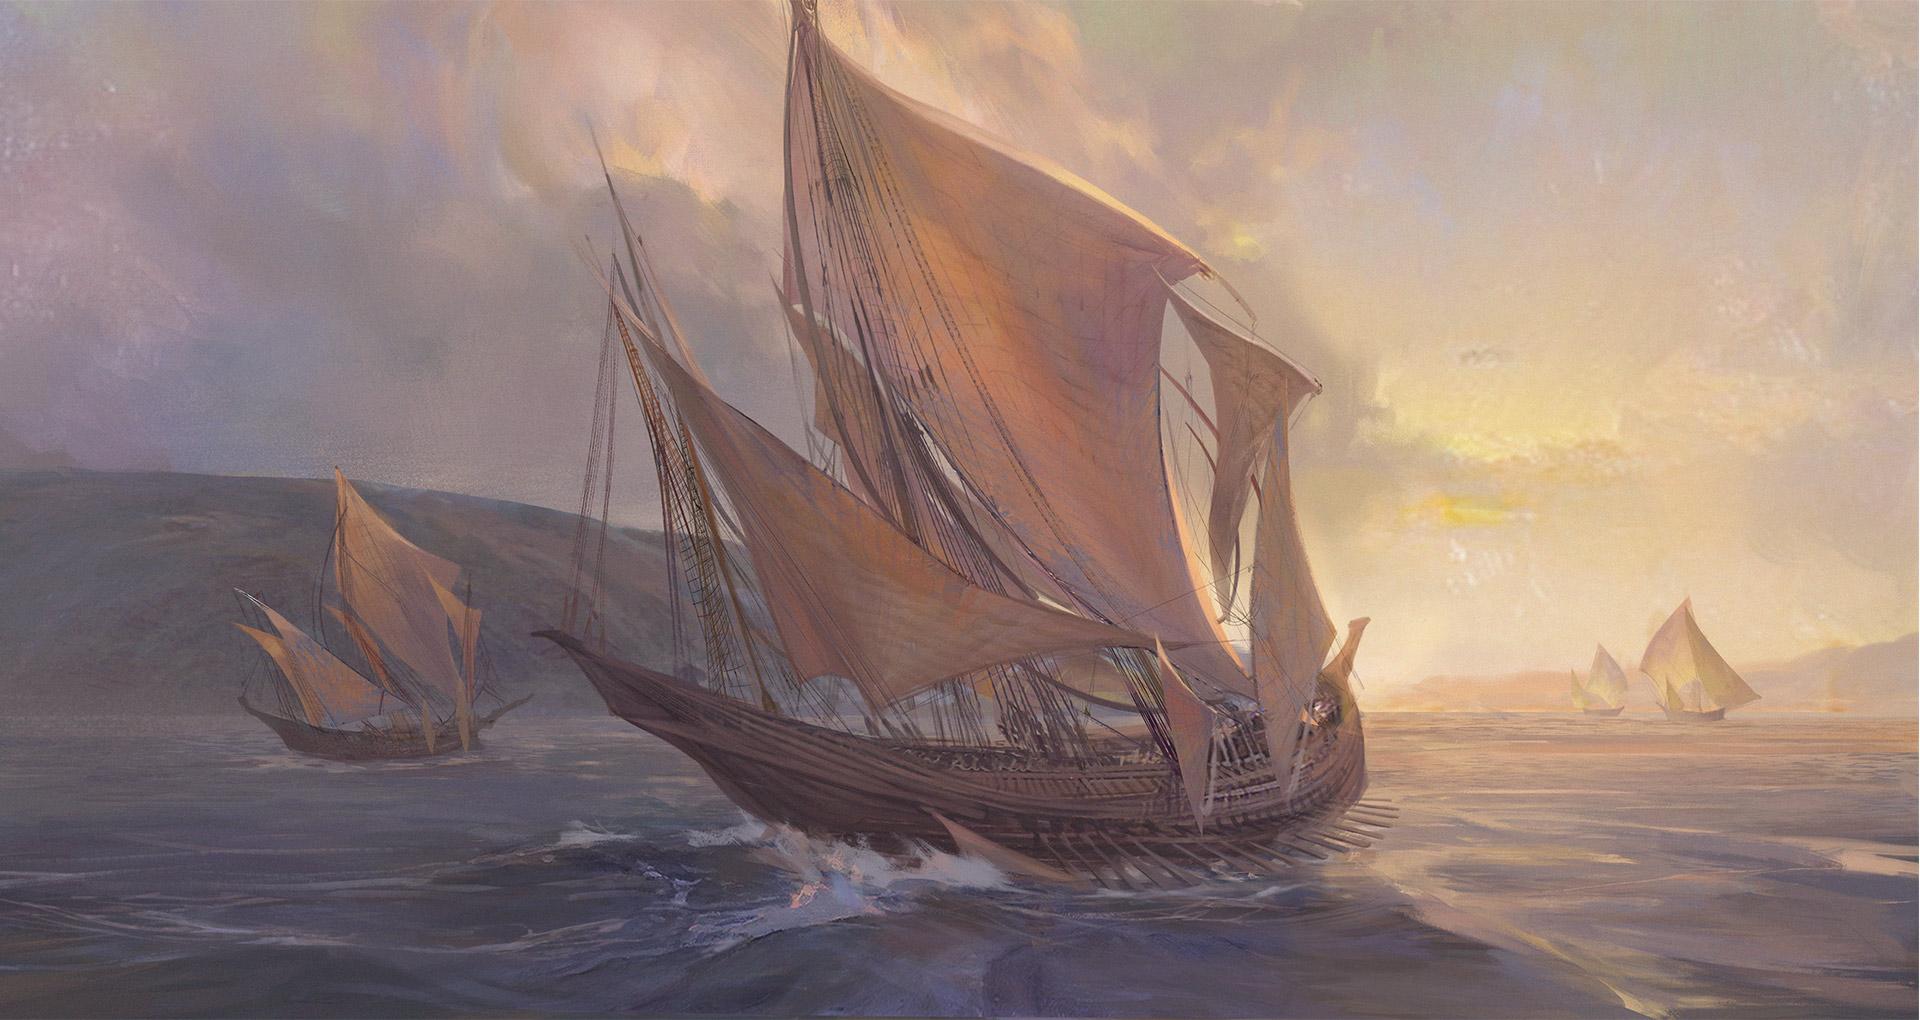 03_Boat.jpg